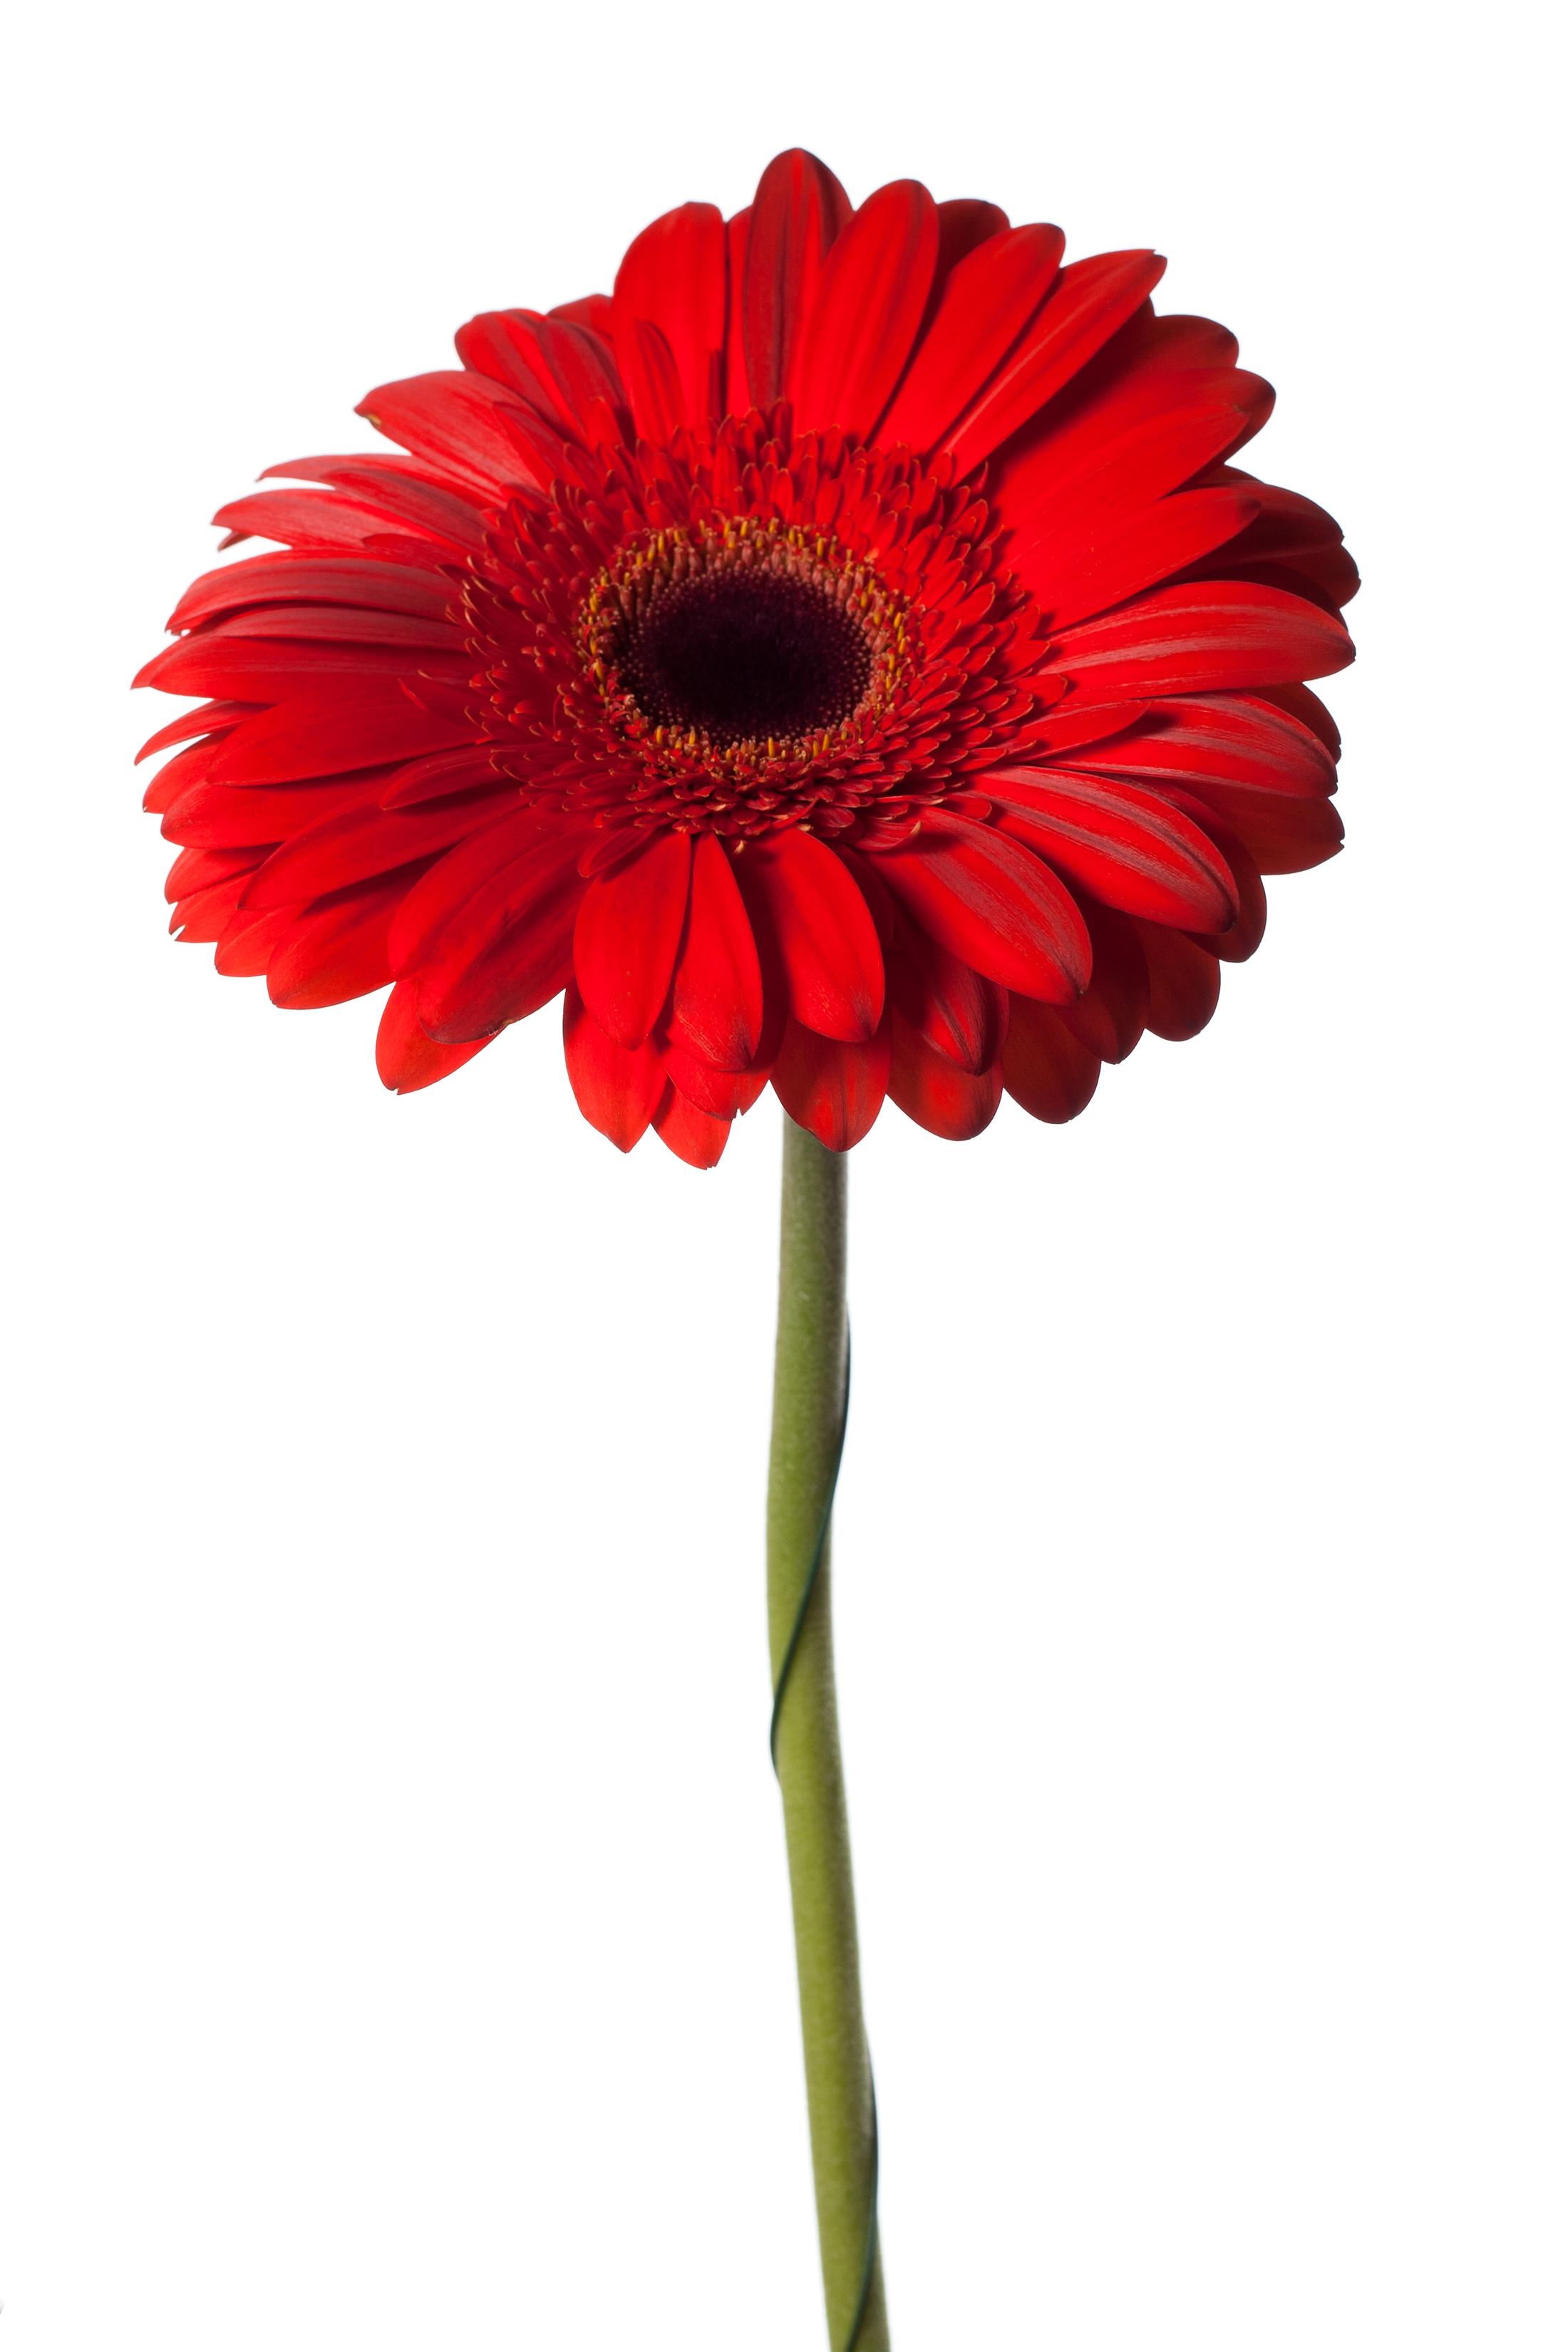 Free Photo Red Flower Plant Petal Spring Free Download Jooinn